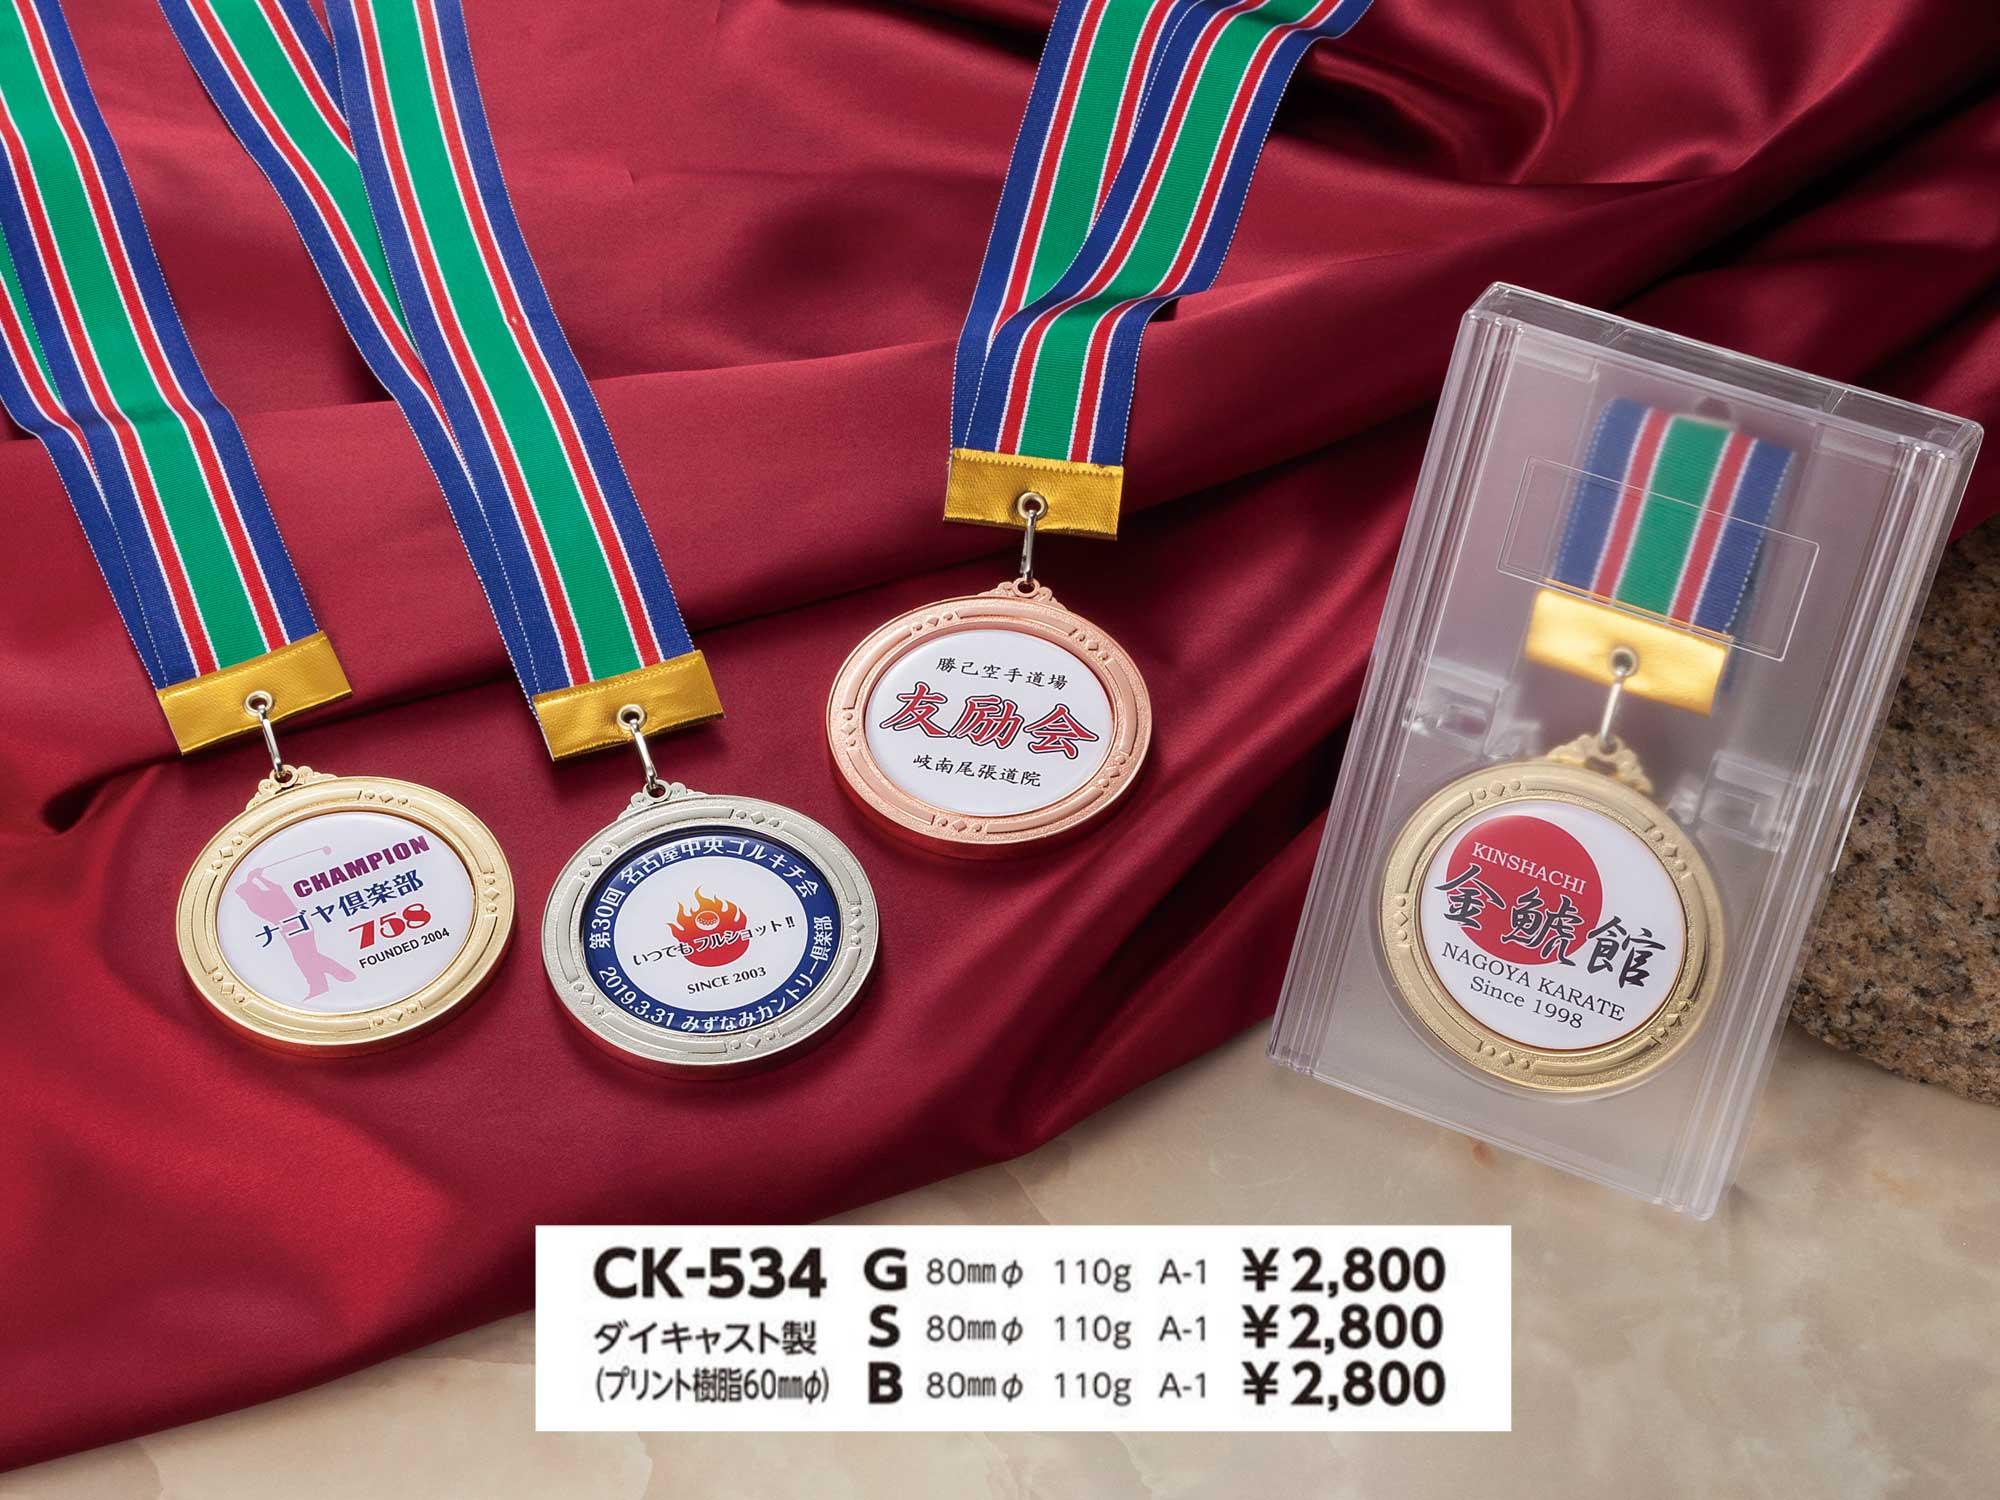 CK534